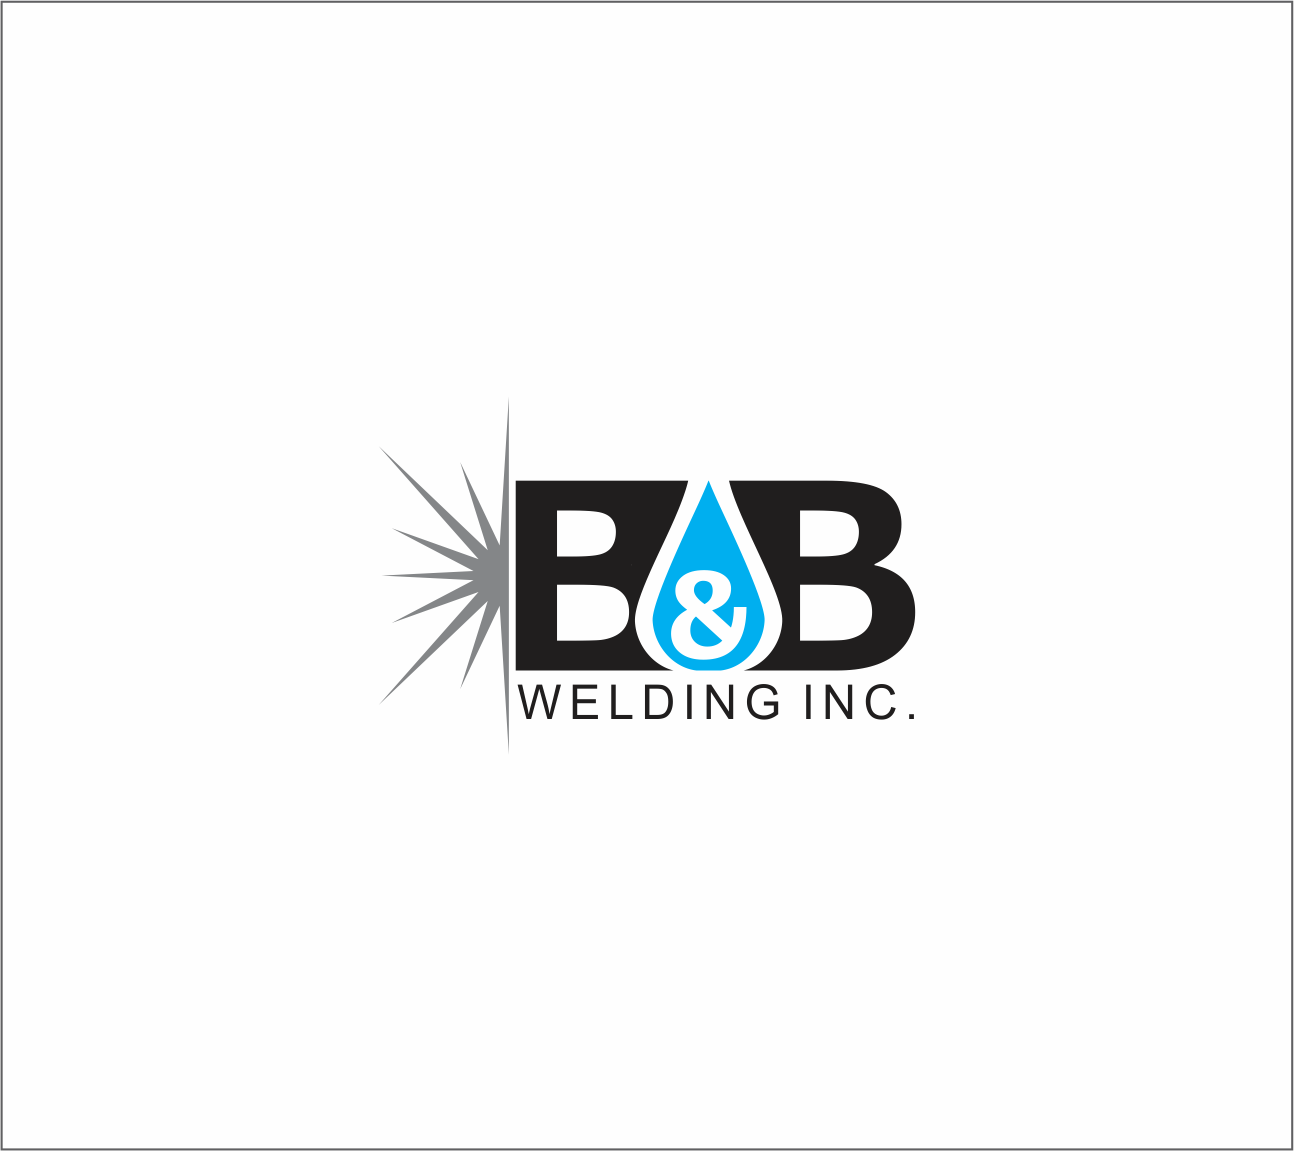 Logo Design by Armada Jamaluddin - Entry No. 31 in the Logo Design Contest Fun Logo Design for B&B Welding Inc..